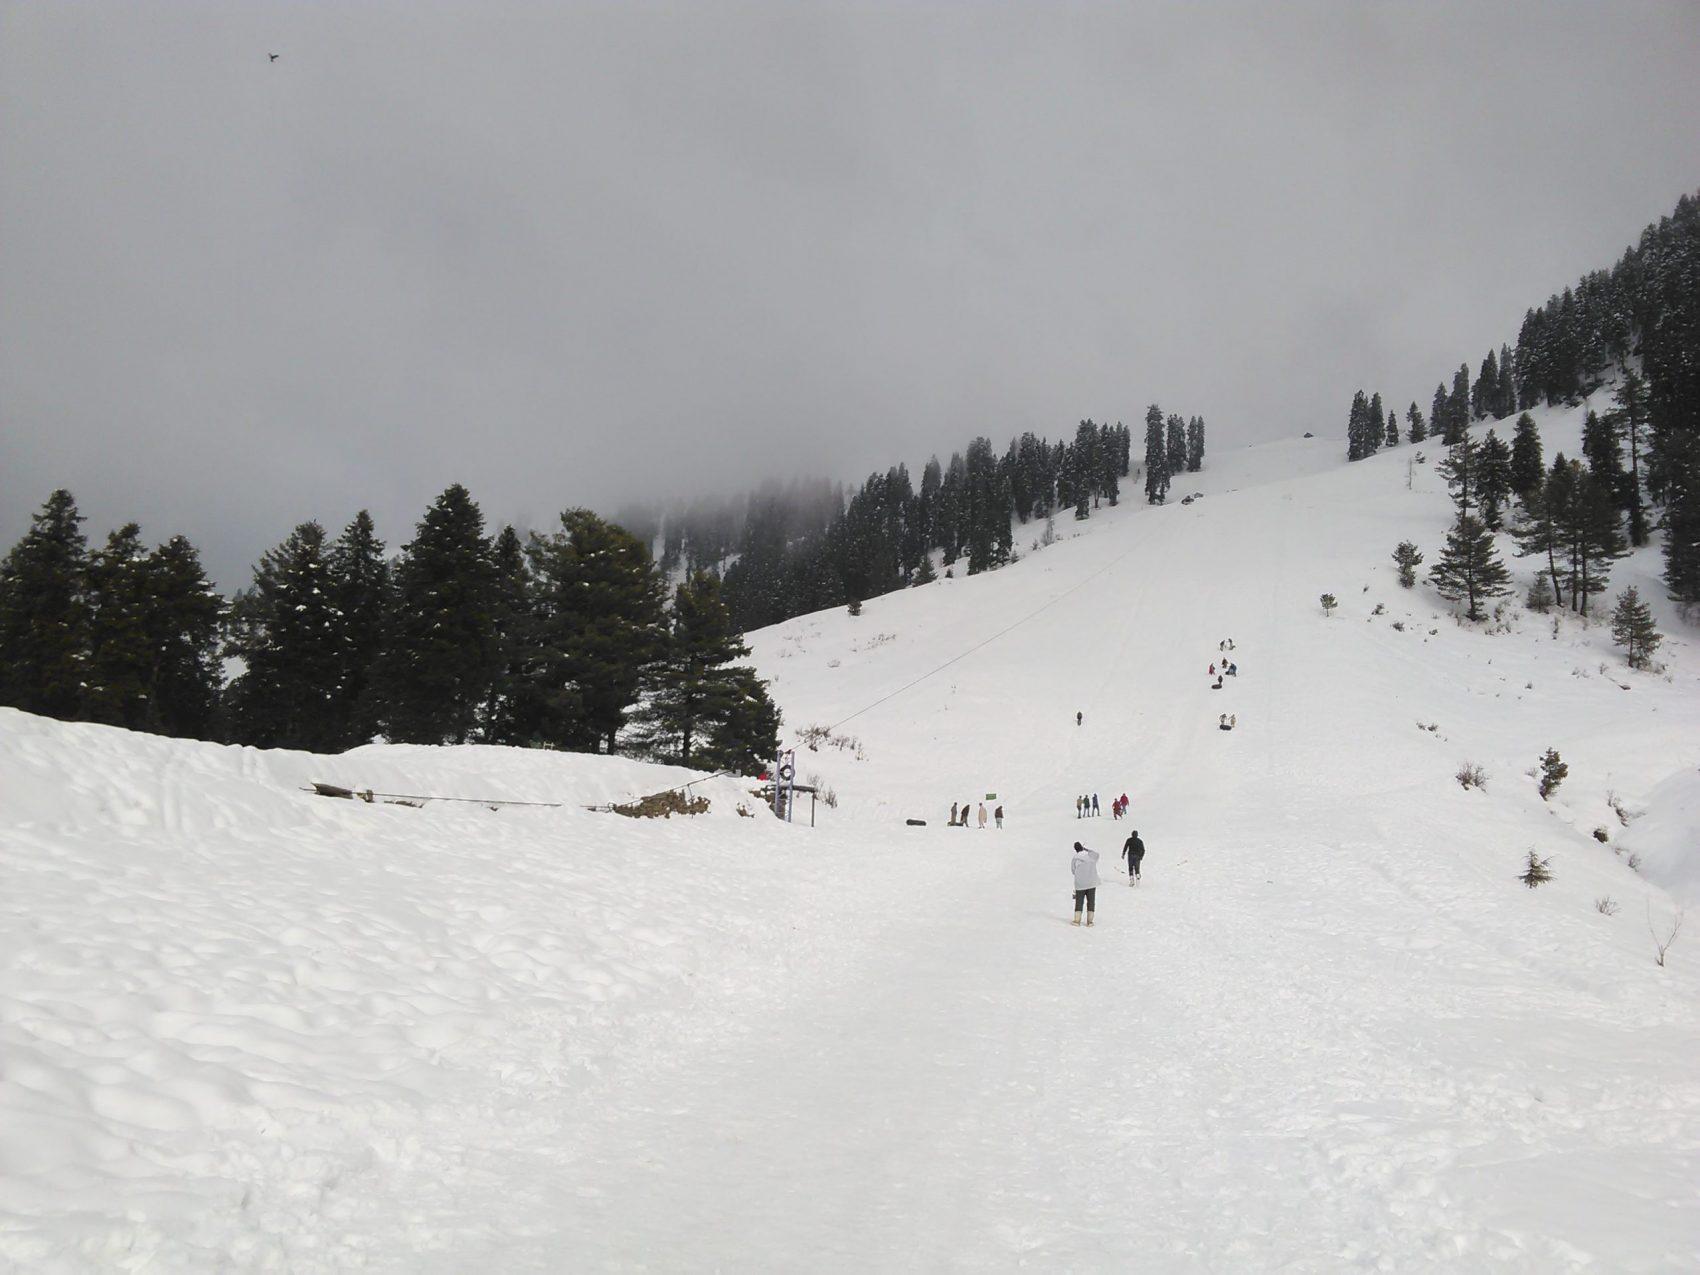 Pakistan, Ski Resort, Cable Car